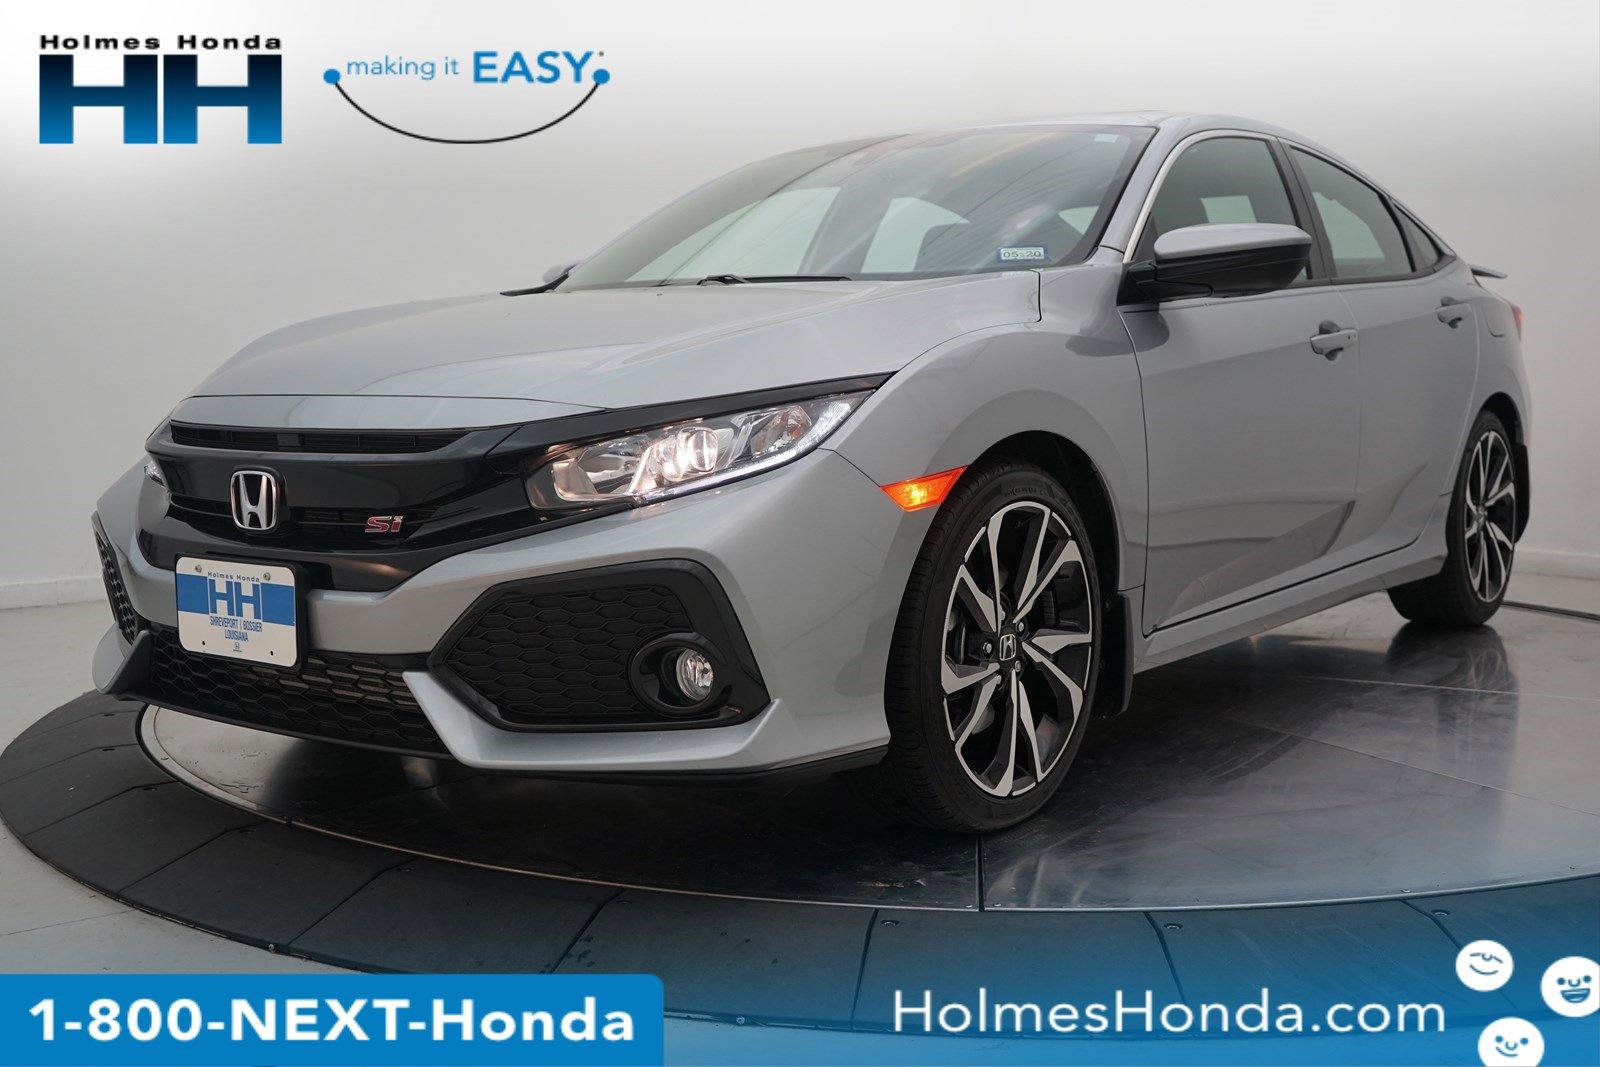 2018 Honda Civic Si Sedan image